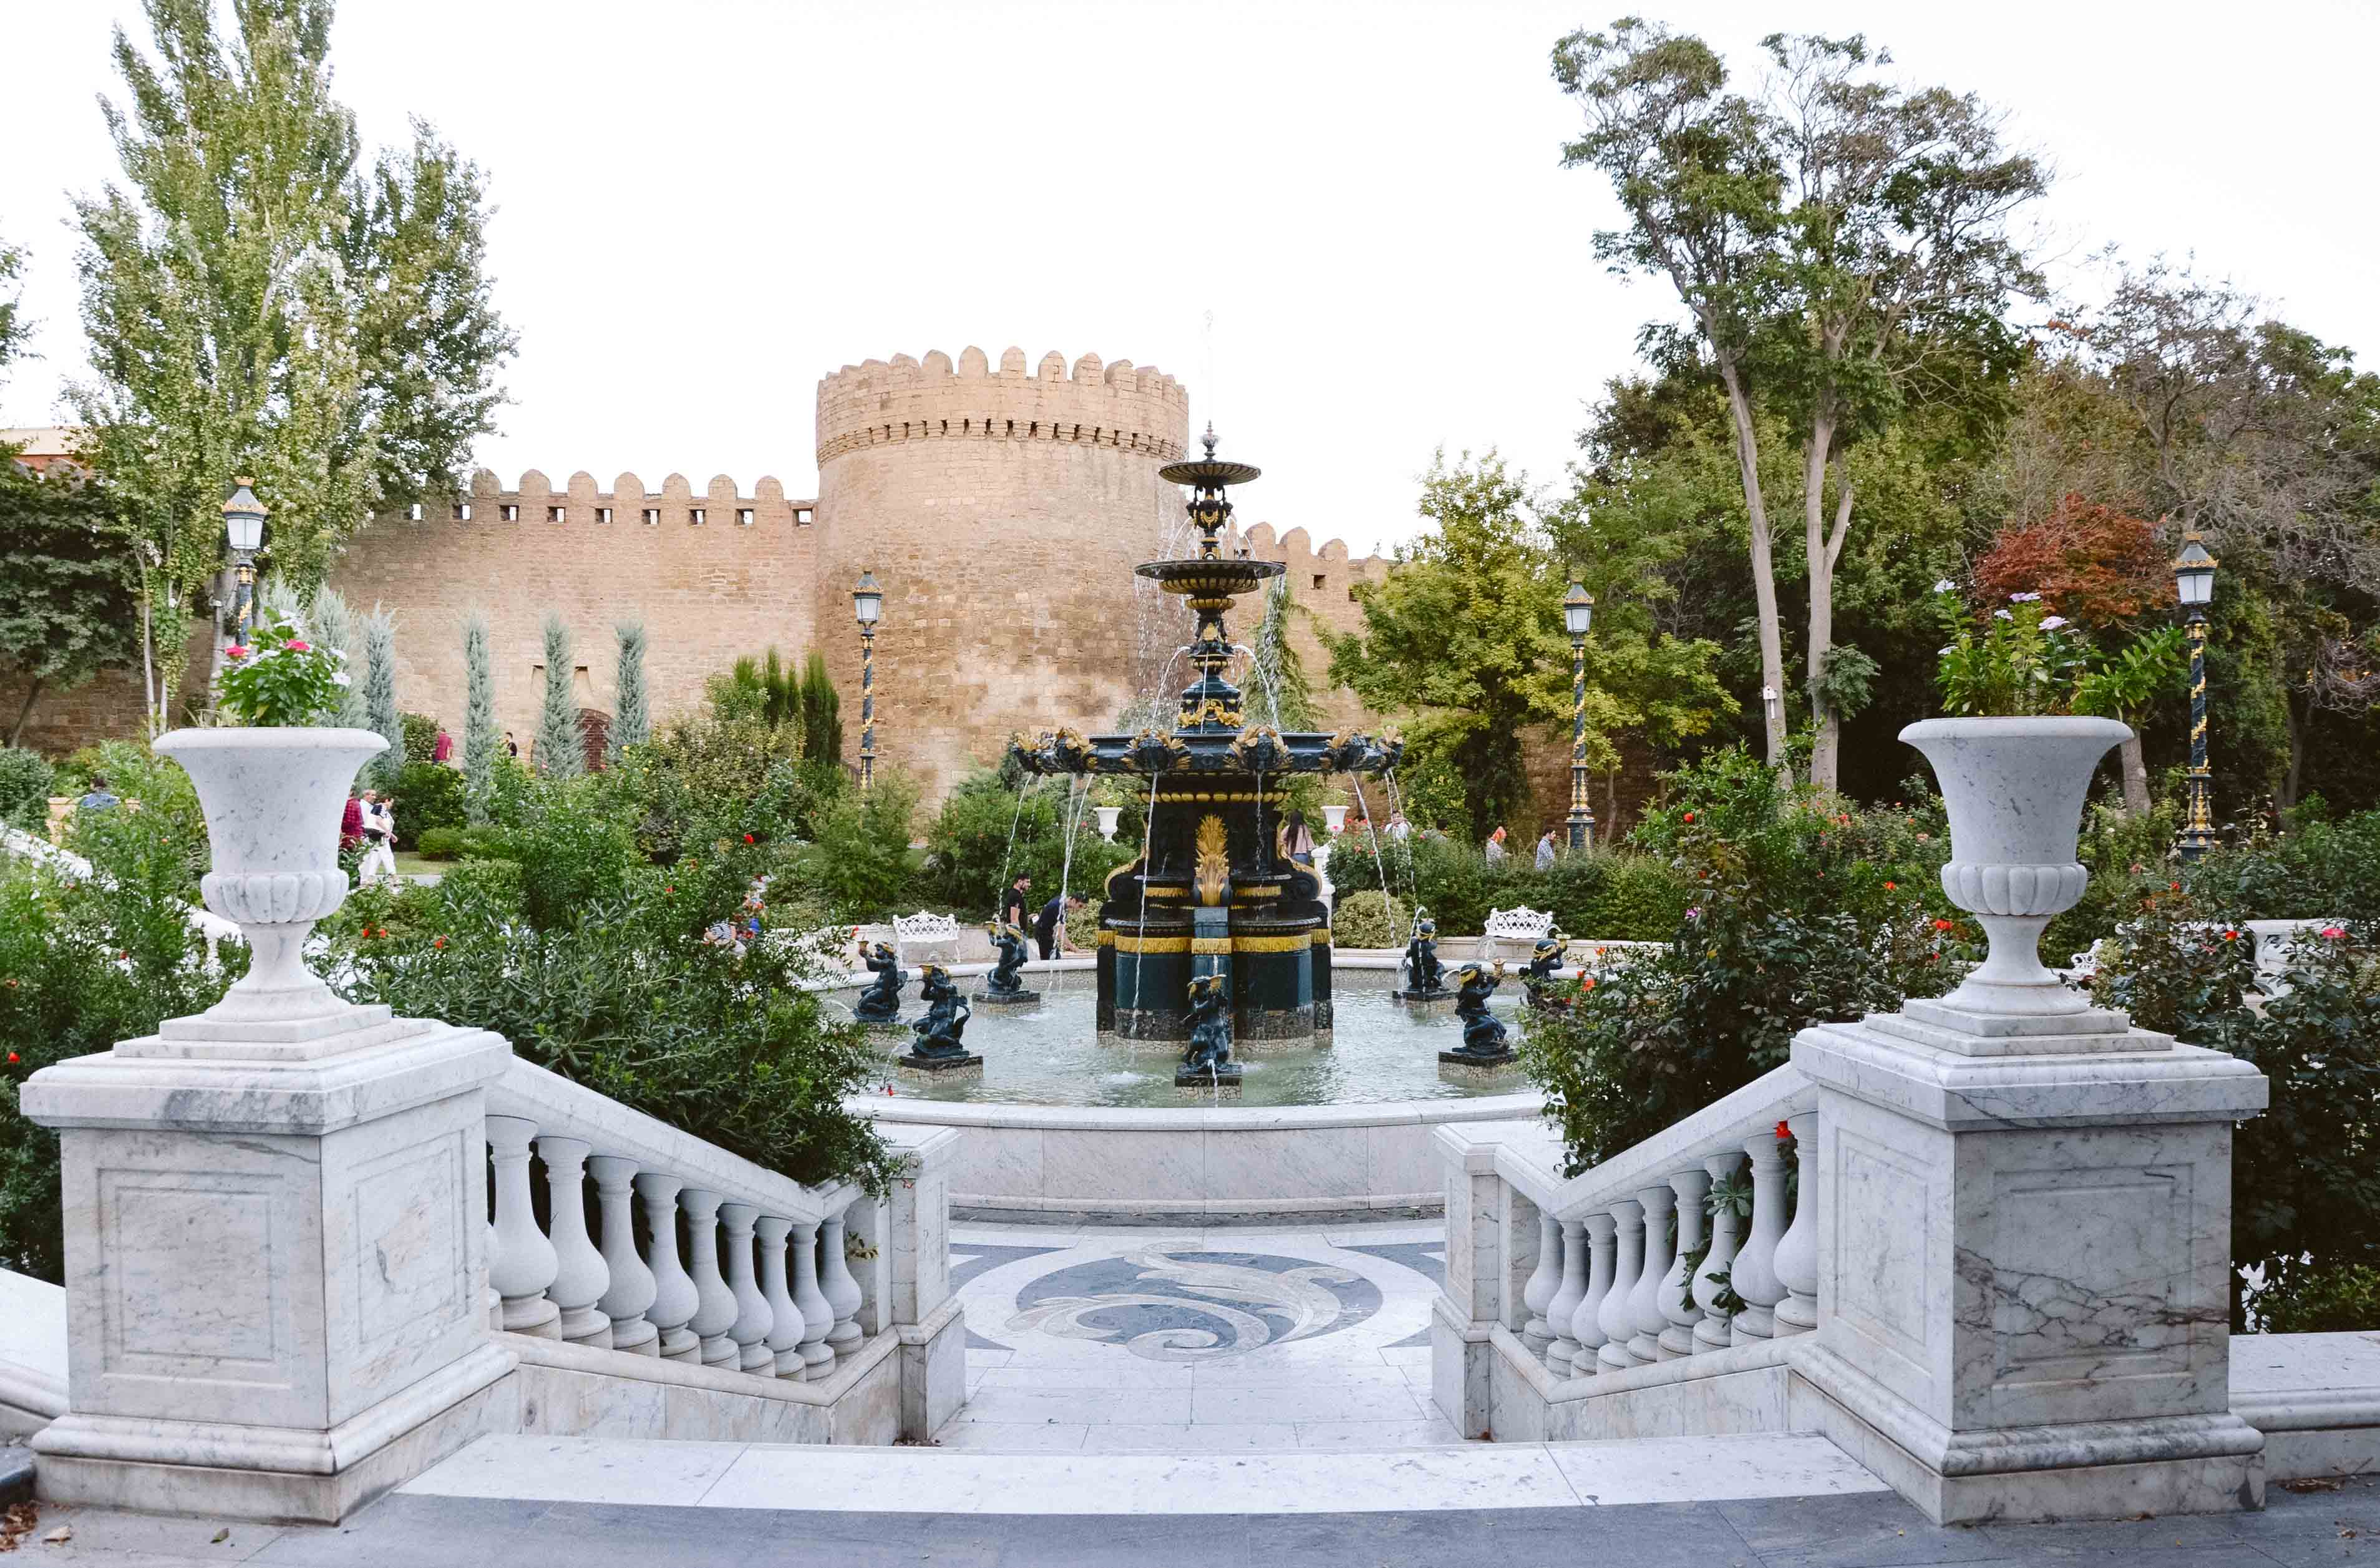 Фонтан в Саду Филармонии, Баку, Азербайджан